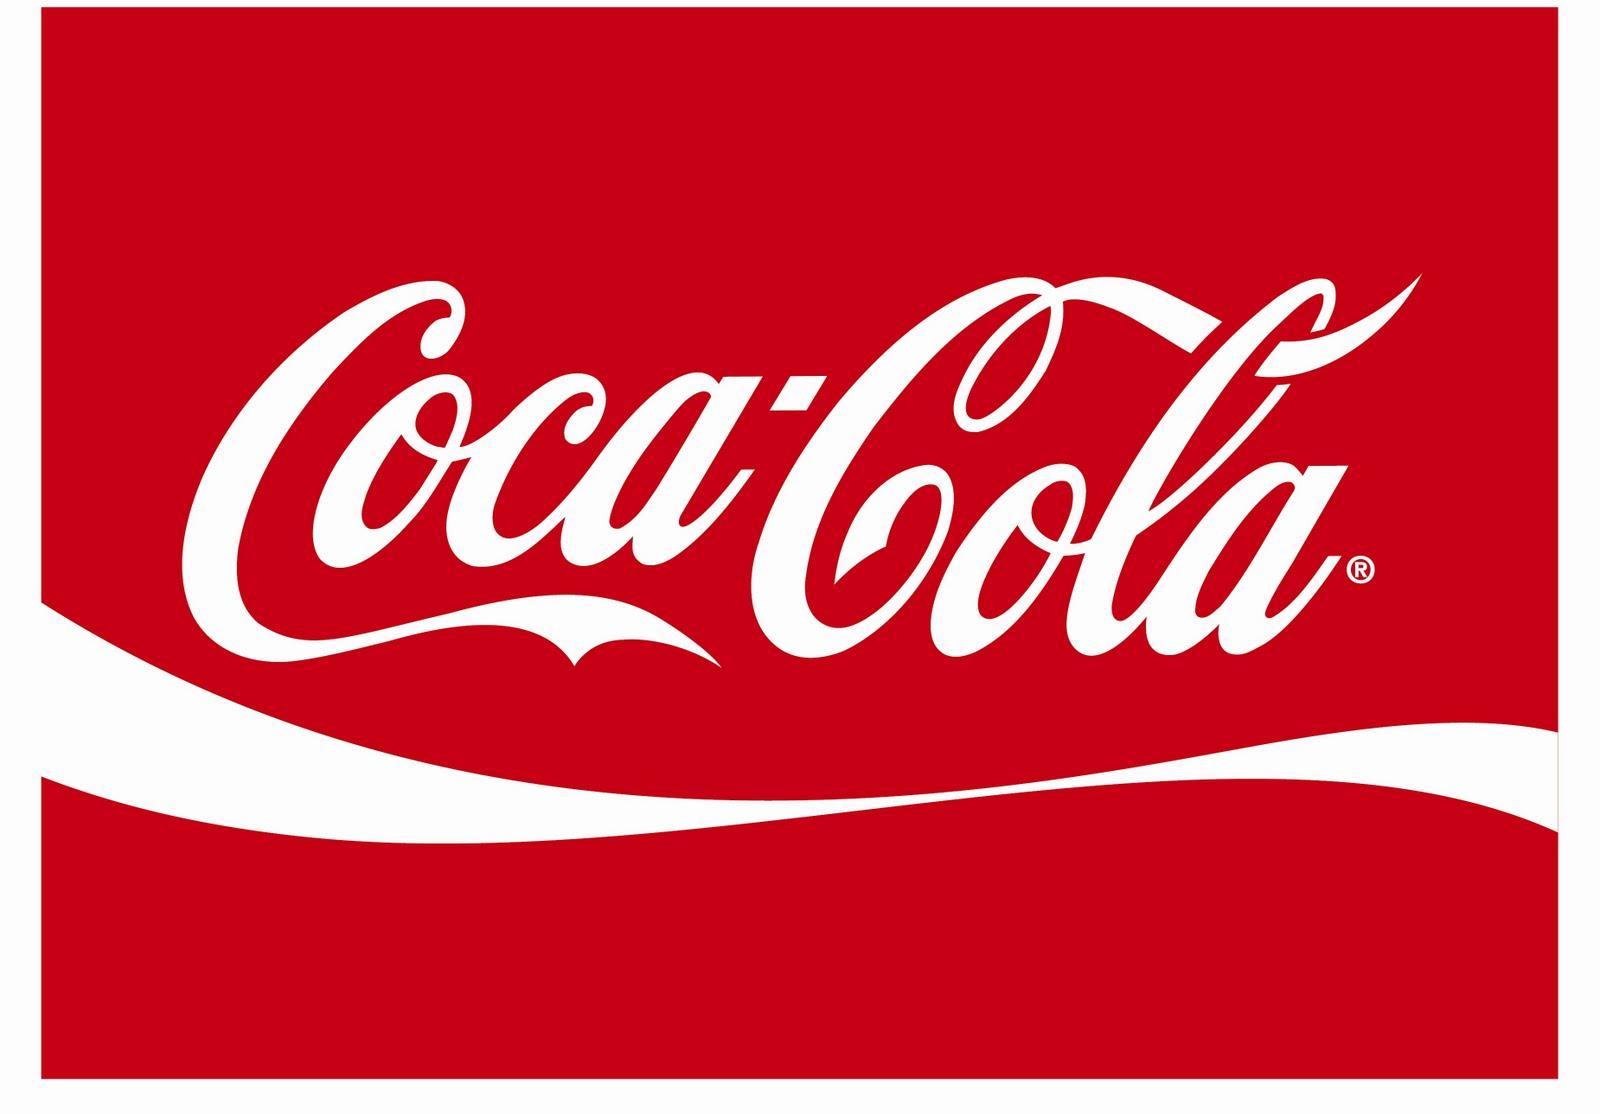 Coca_cola_logo-2